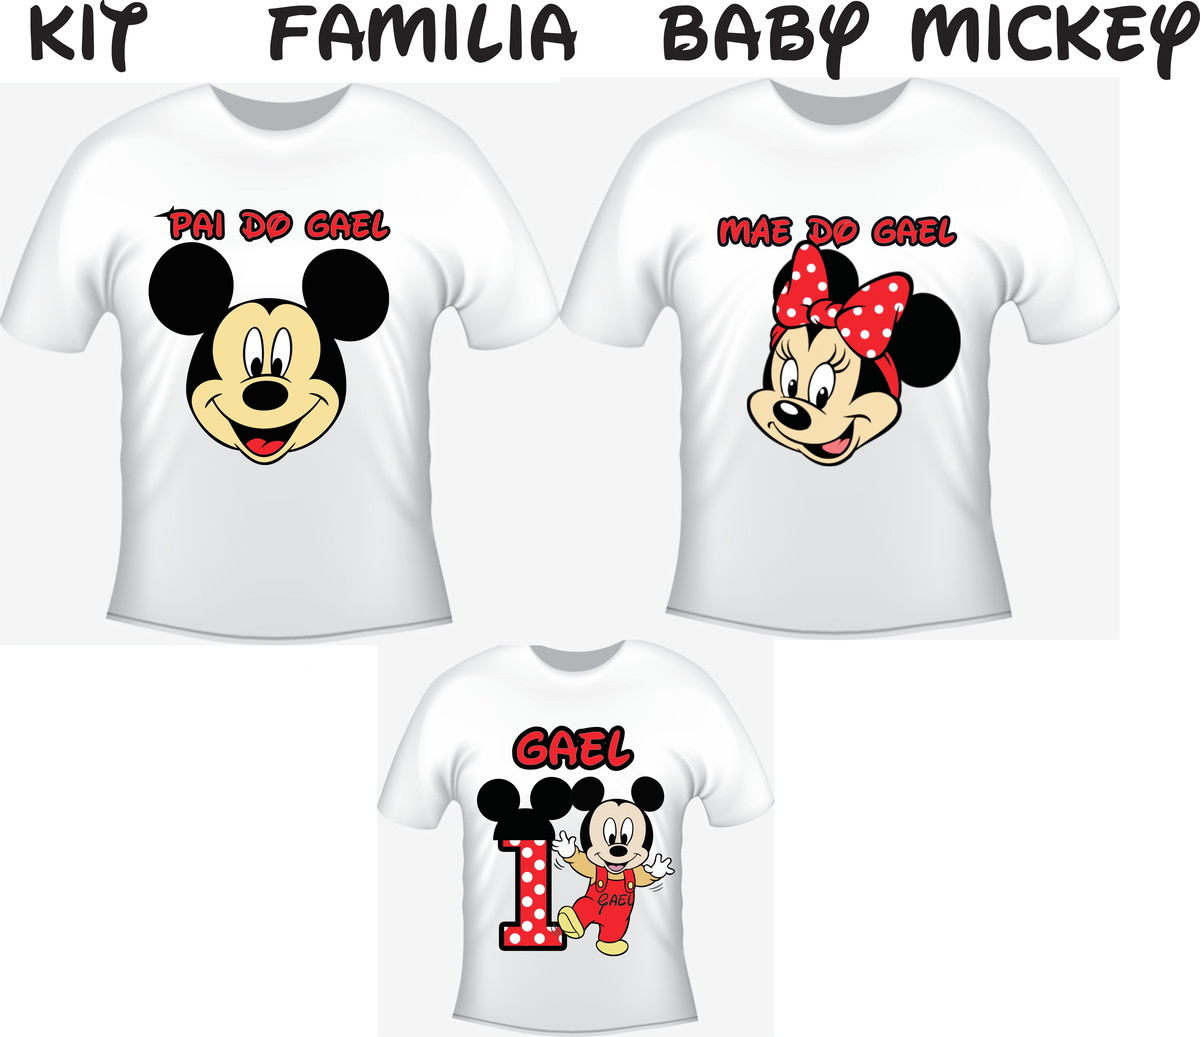 Camiseta Baby Mickey Kit  03 camisetas - Personalizada no Elo7 ... 97d84122b78f8